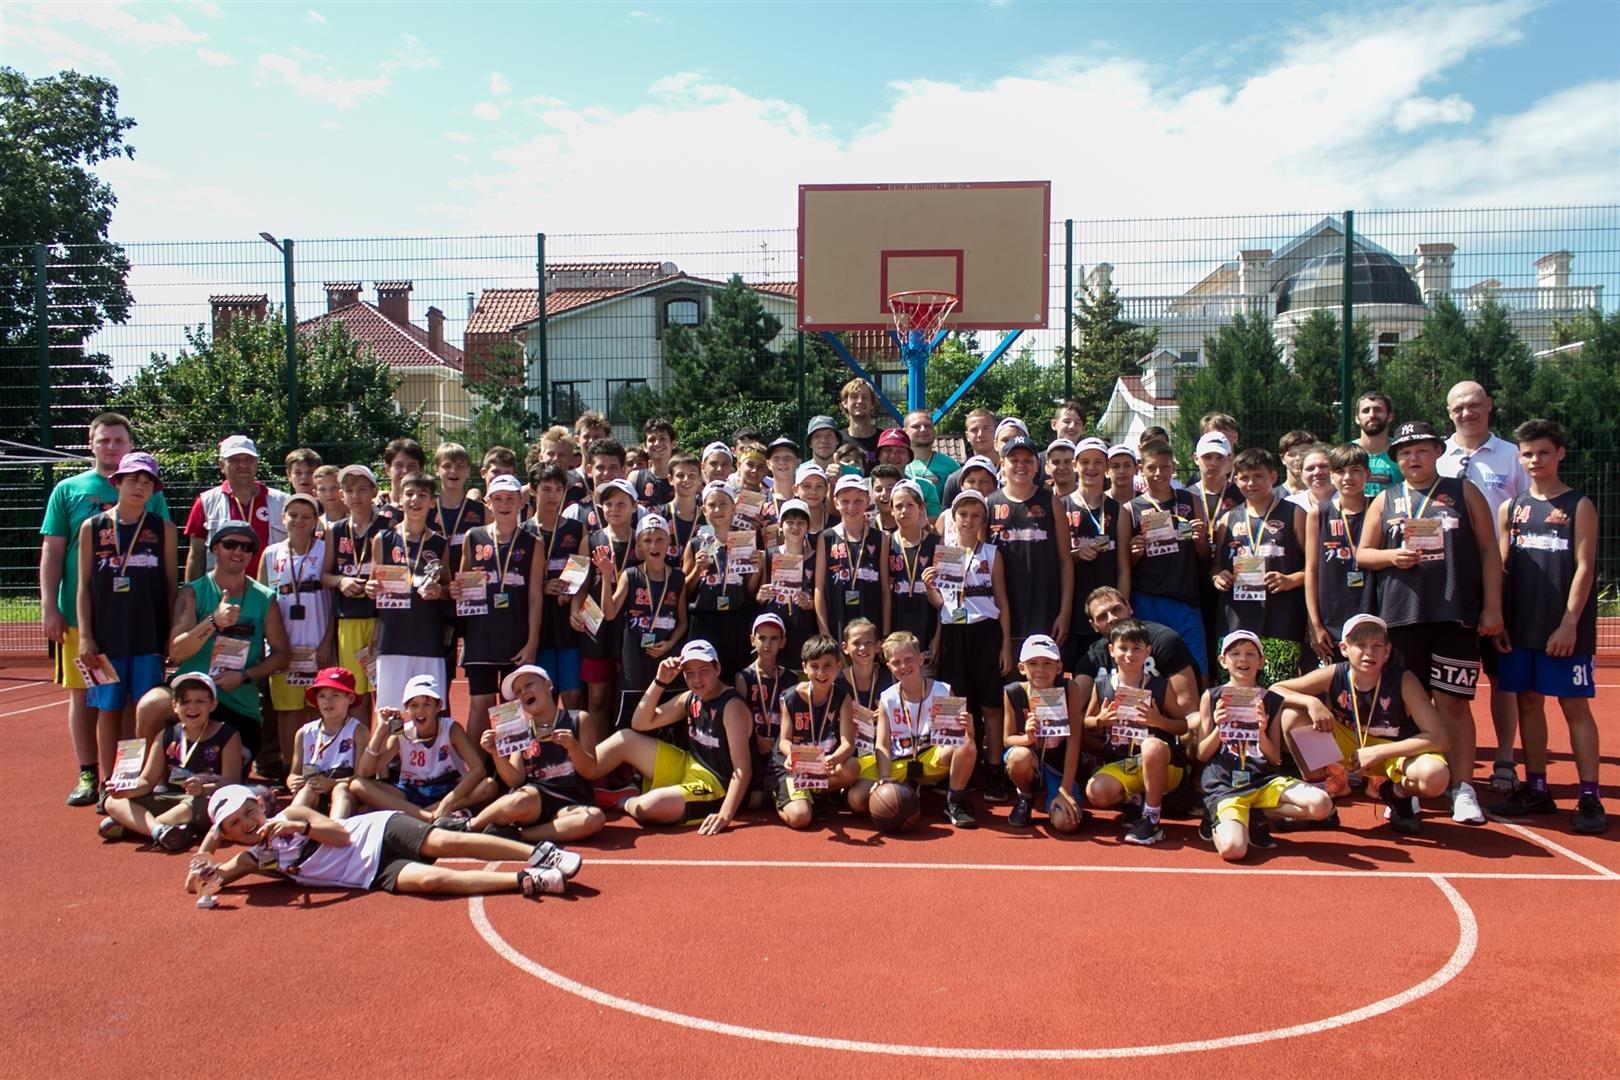 12-22.07.2021 BASKETBALL SCHOOL CAMP 2021